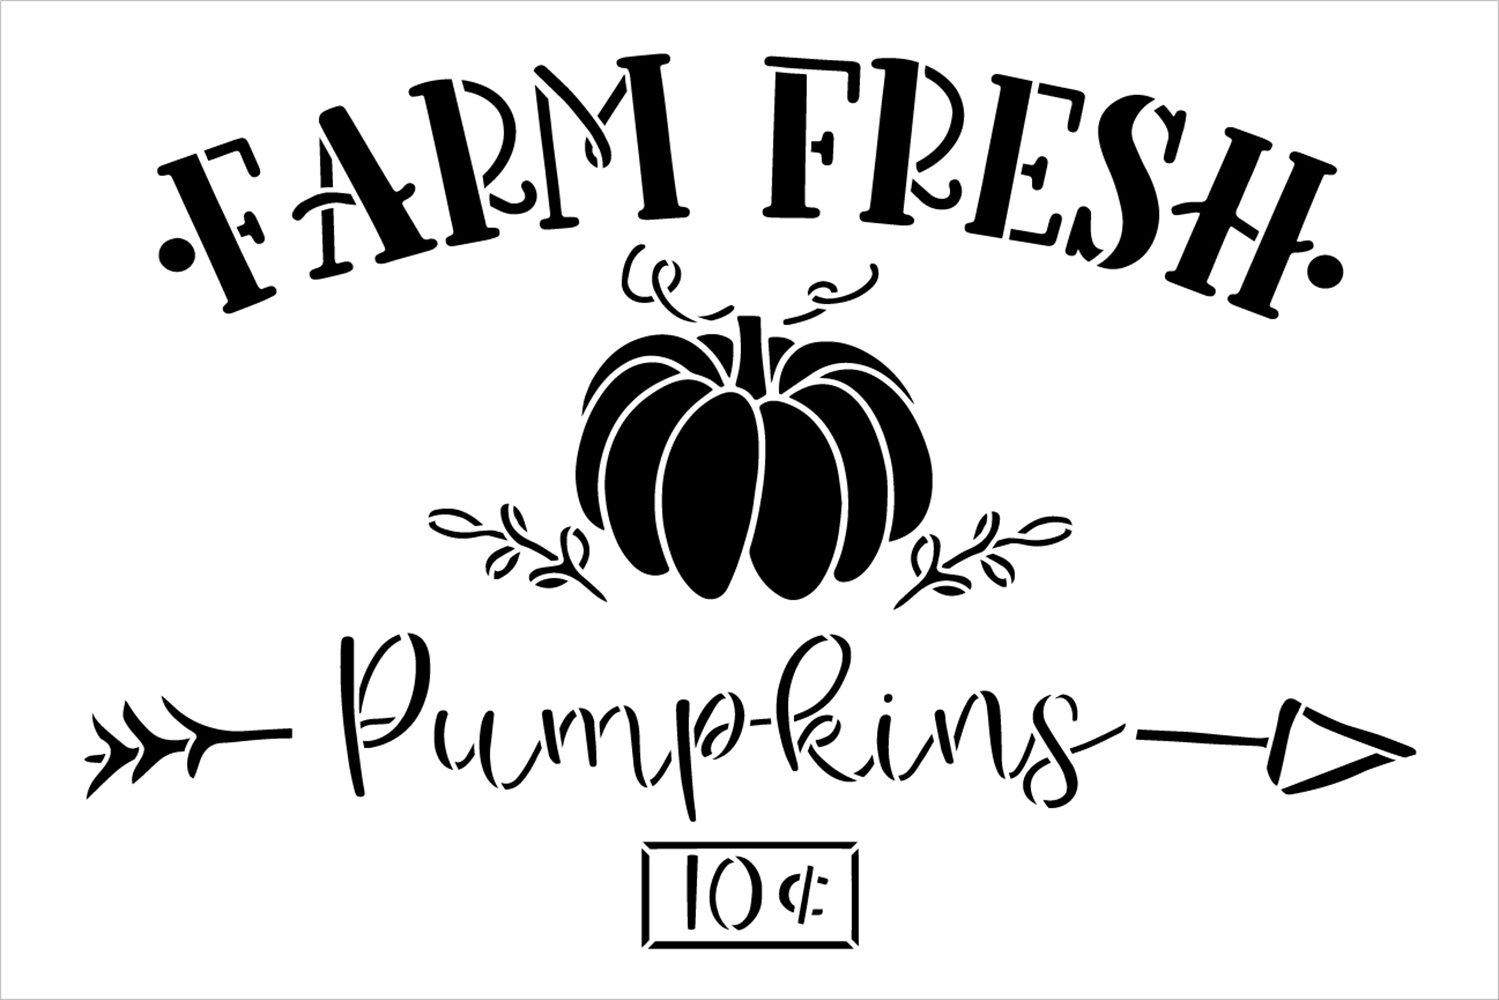 Farm Fresh Pumpkins 10 Cents Stencil by StudioR12 | Craft DIY Fall Autumn Farmhouse Home Decor | Paint Wood Sign Reusable Mylar Template | Select Size